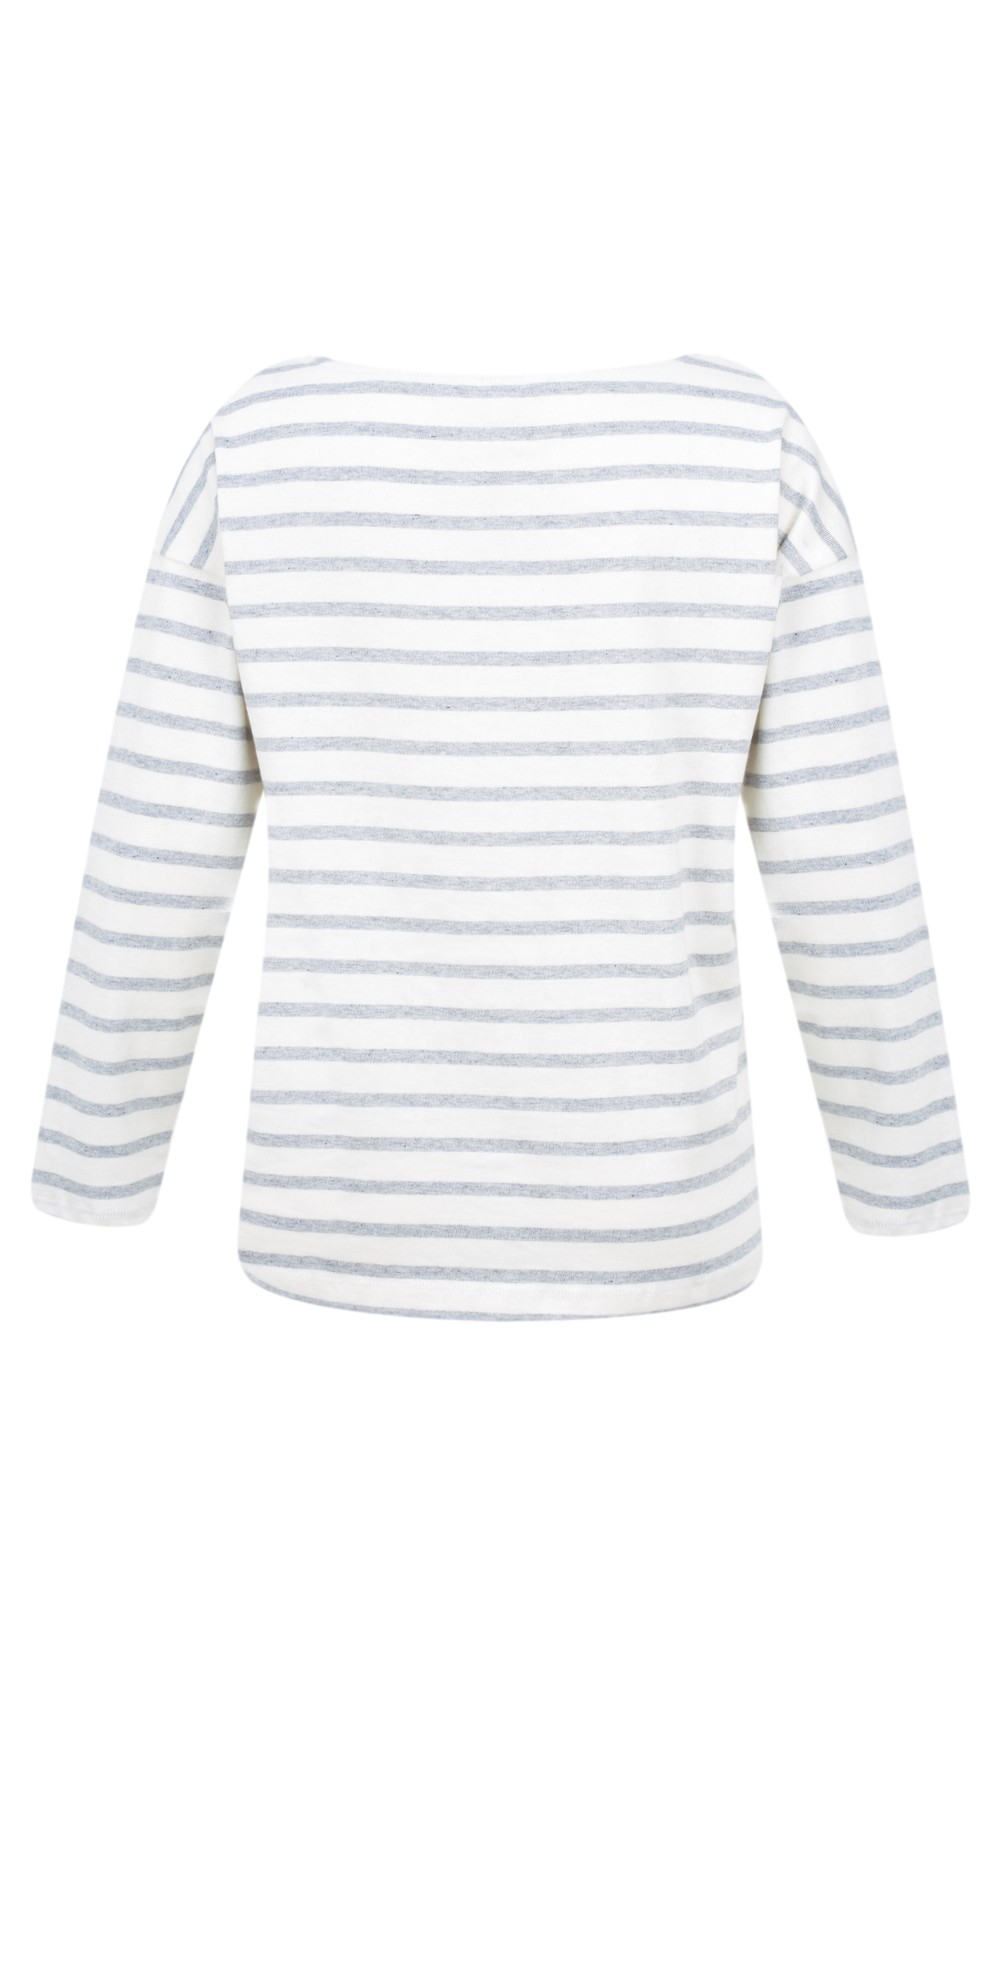 Good Vibes Stripe Long Sleeve Top main image